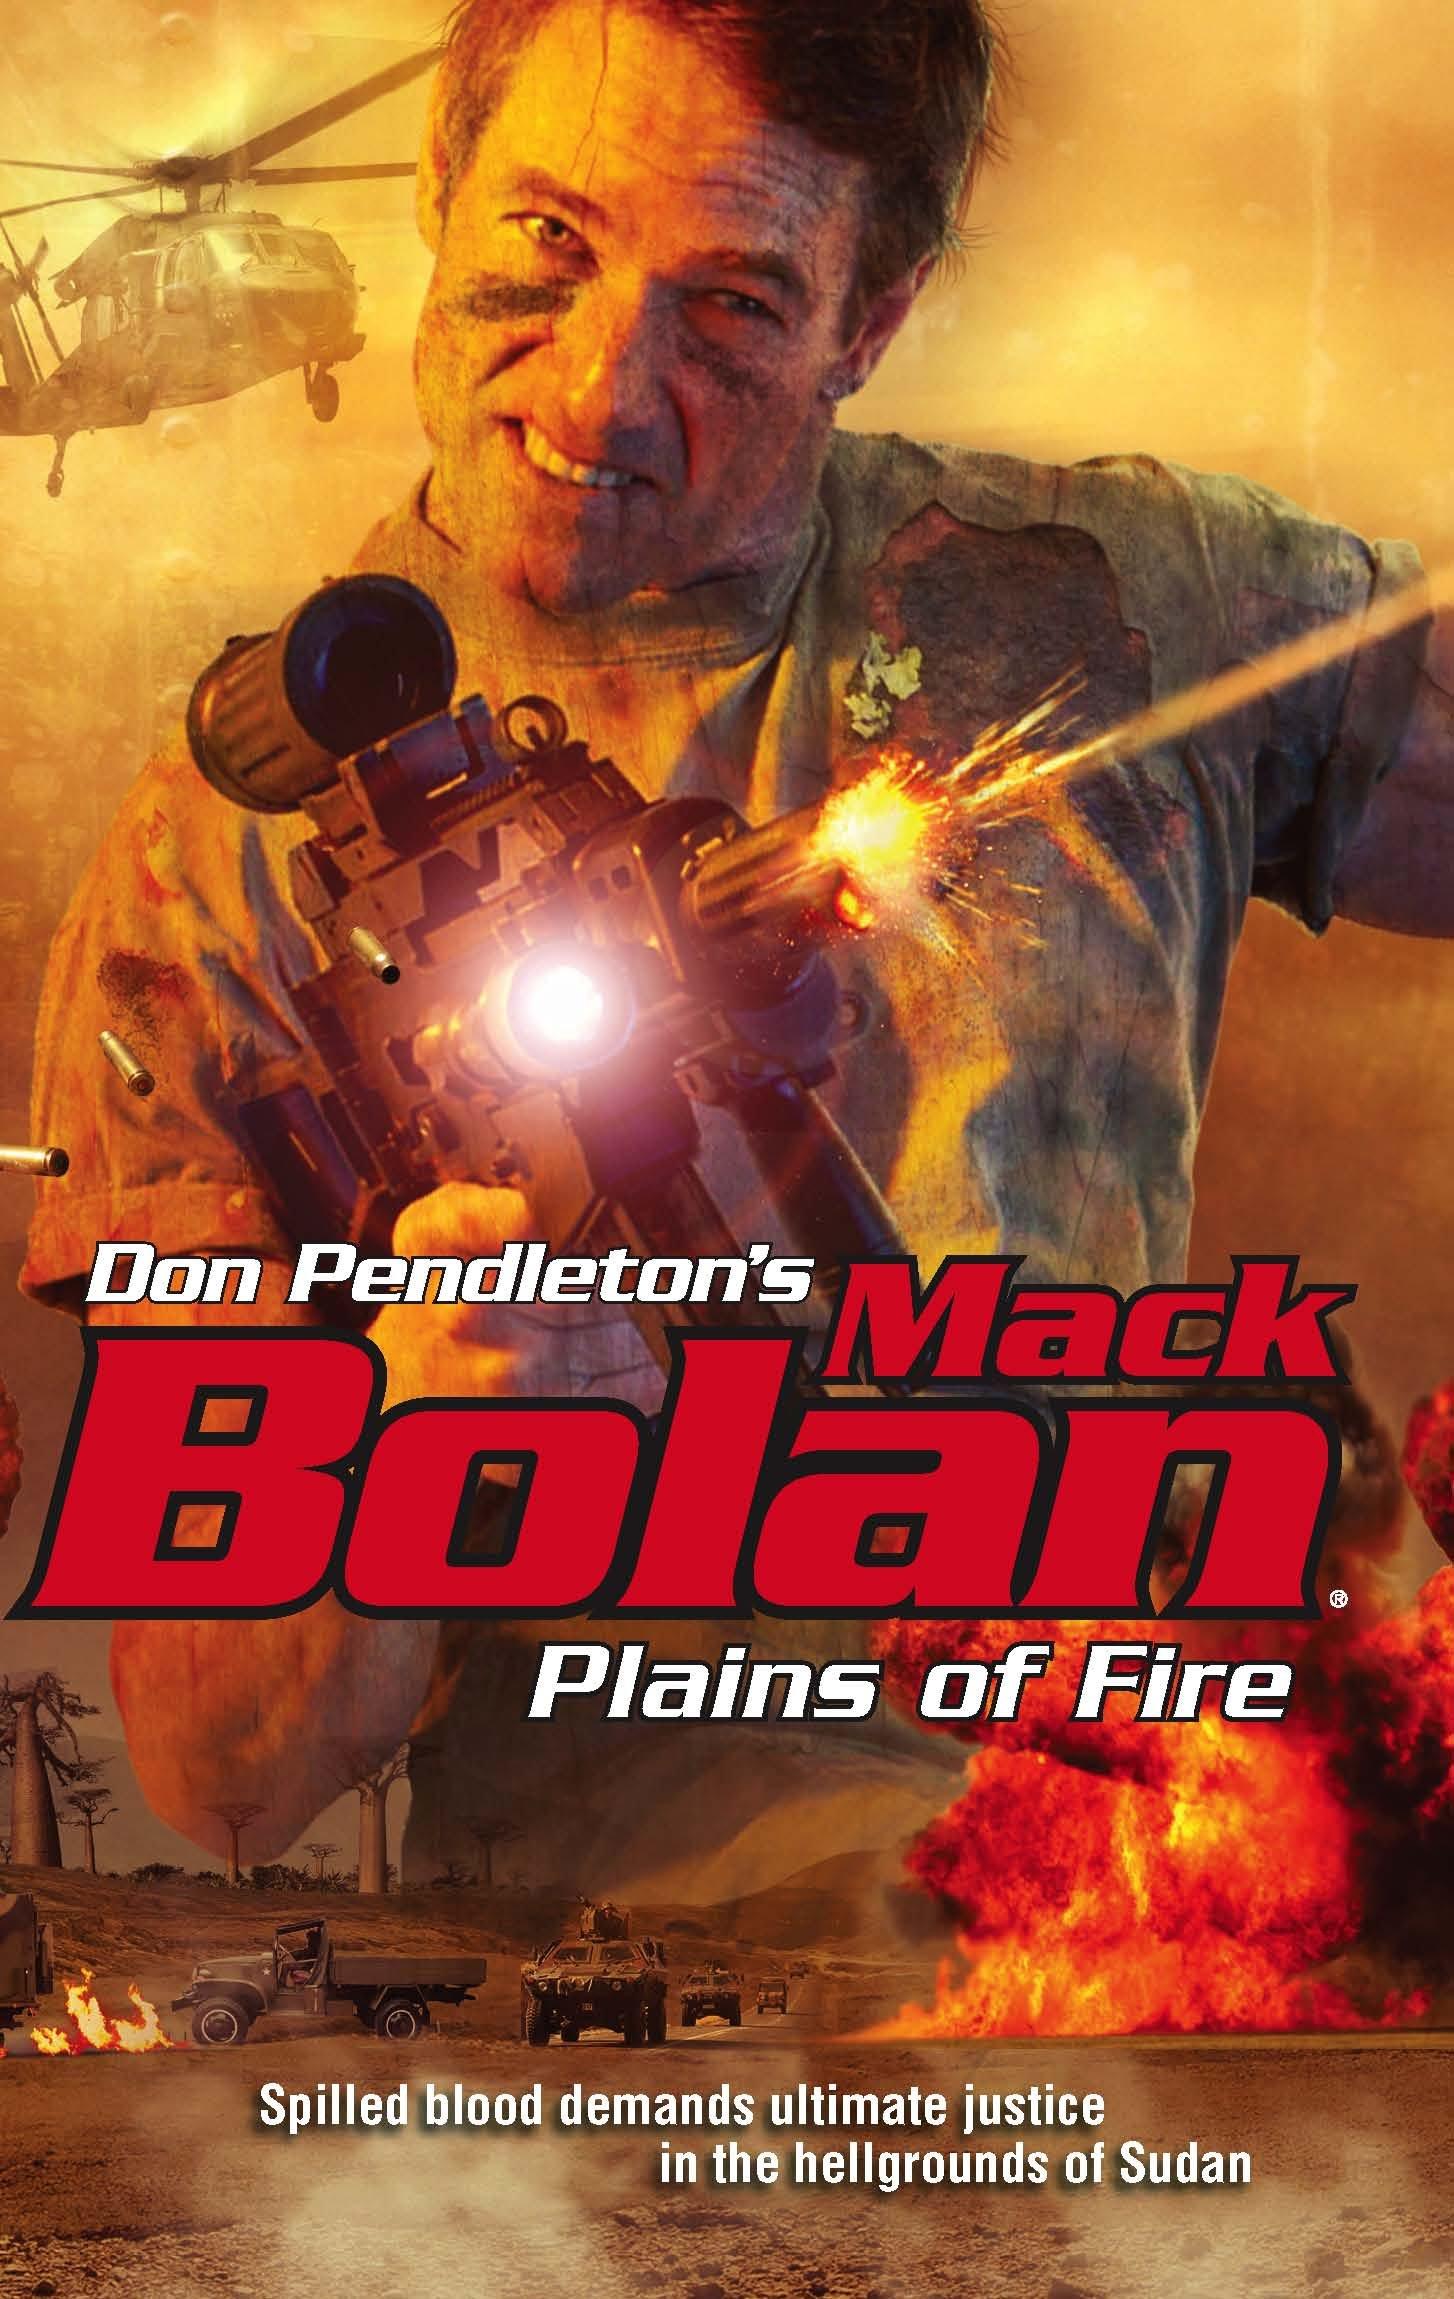 Amazon.com: Plains Of Fire (SuperBolan) (9780373615261): Don Pendleton:  Books